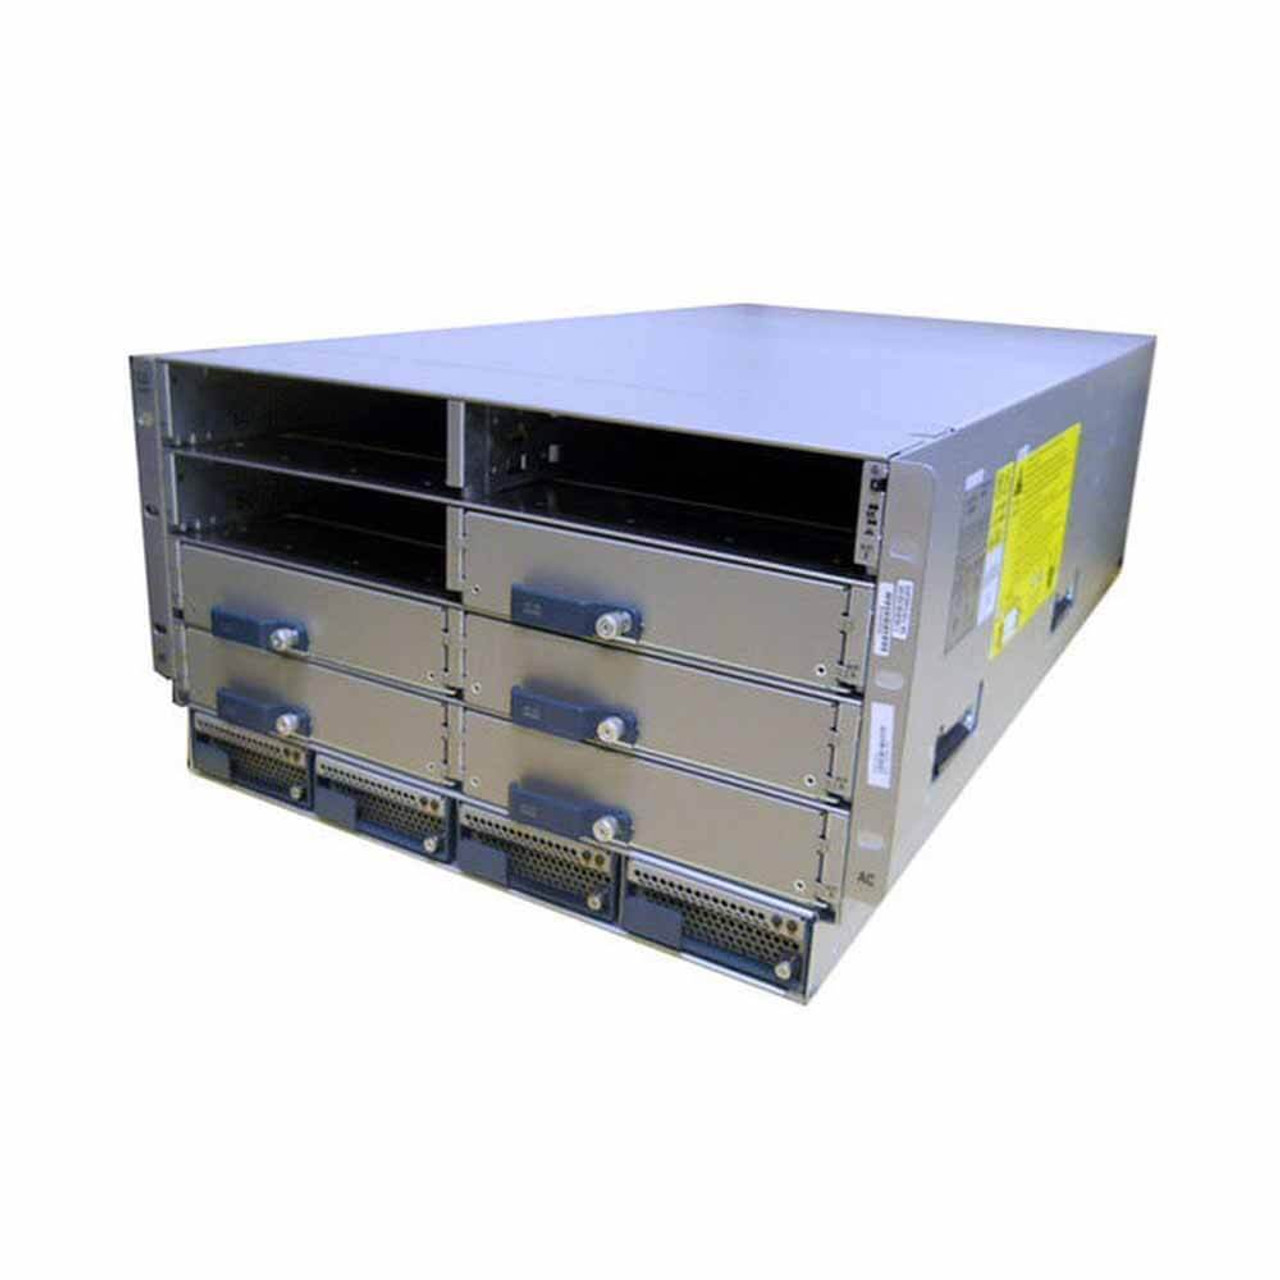 Cisco UCS 5100 Series Blade Server Chassis